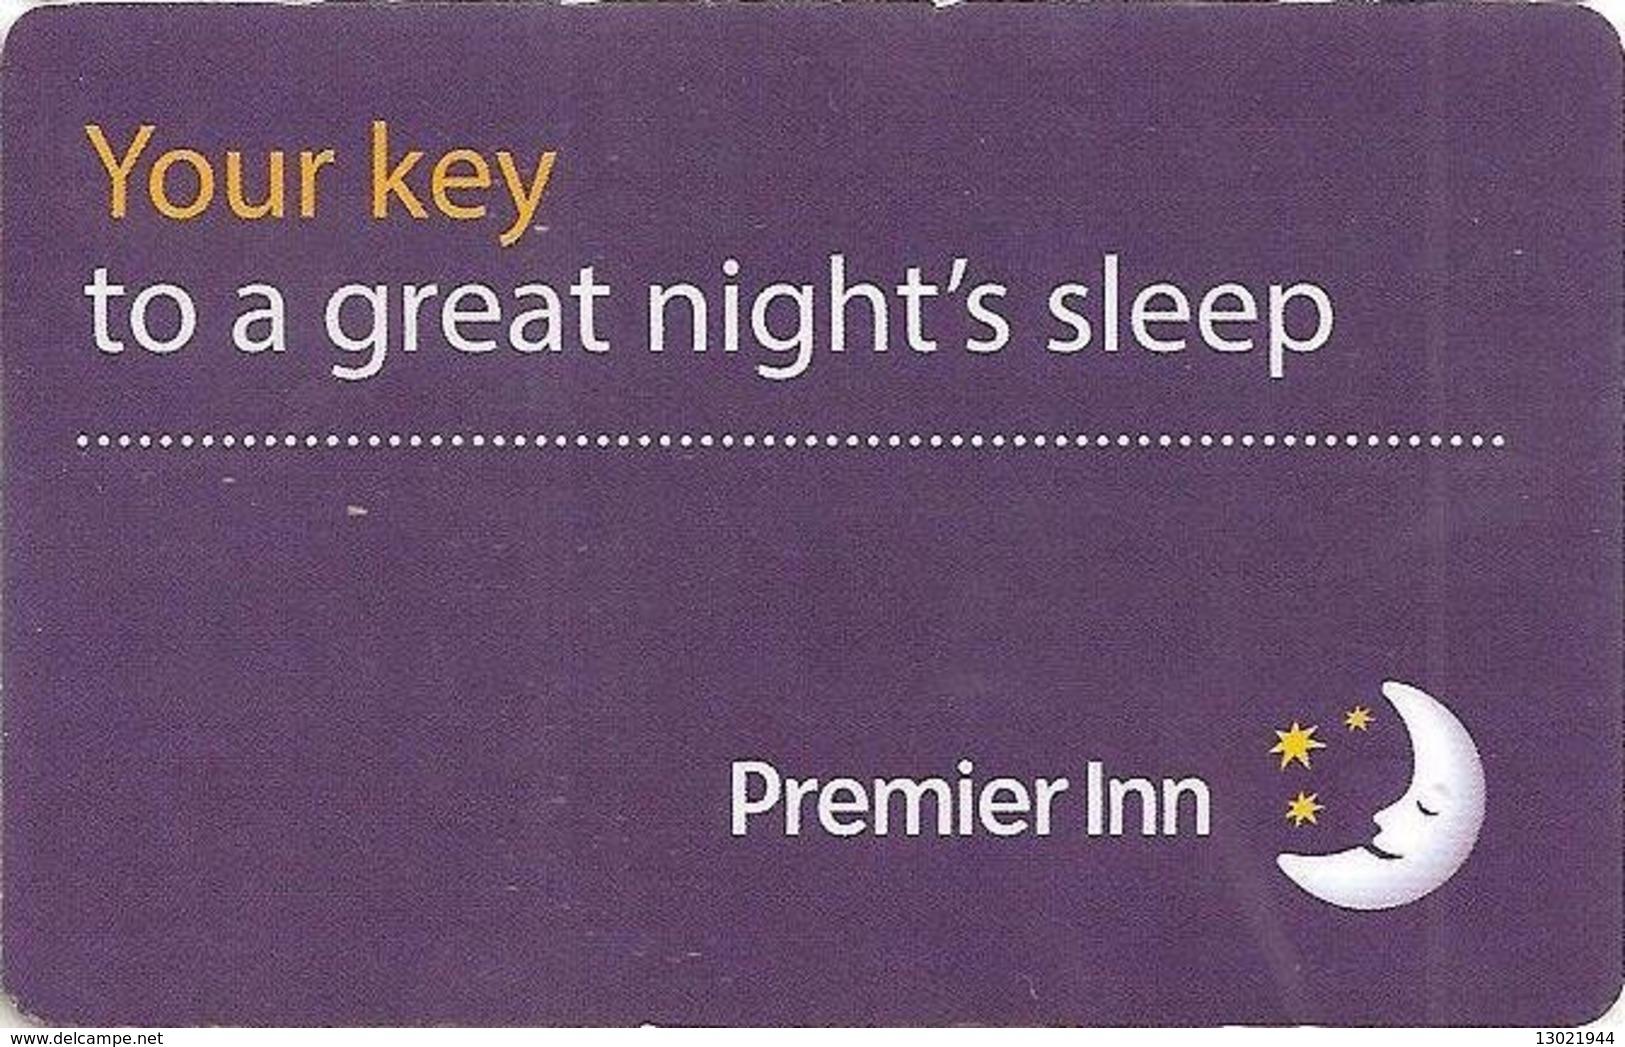 INGHILTERRA KEY HOTEL   Premier Inn - Your Key To A Great Night's Sleep - Cartes D'hotel